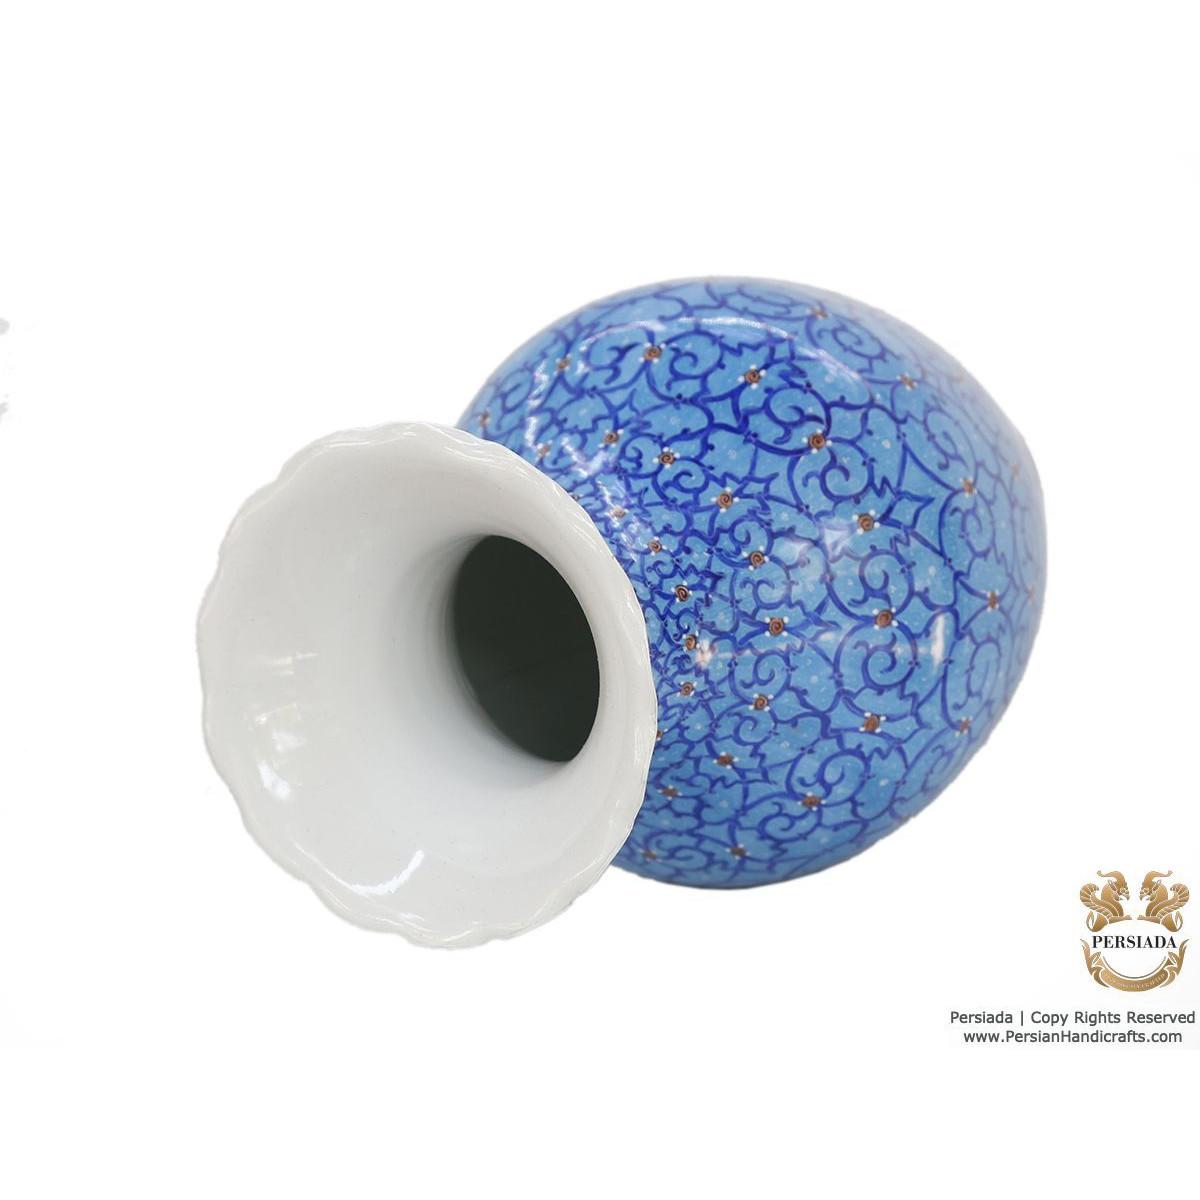 Decorative Flower Vase - Enamel Minakari   PE4114-Persian Handicrafts